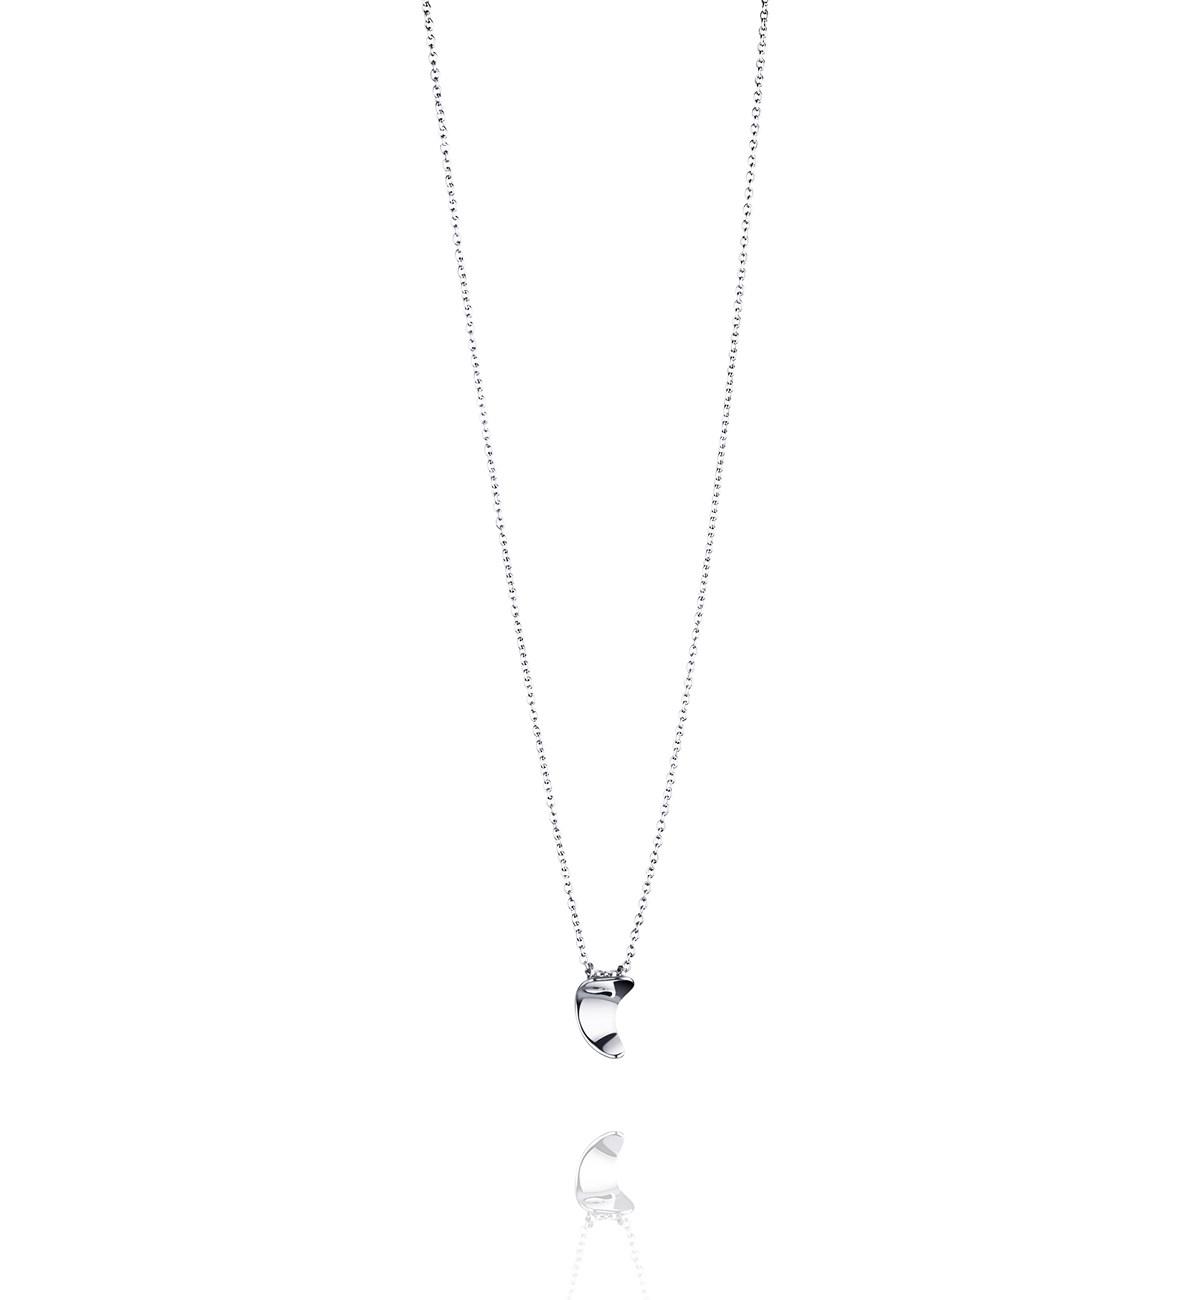 : - Seashell necklace